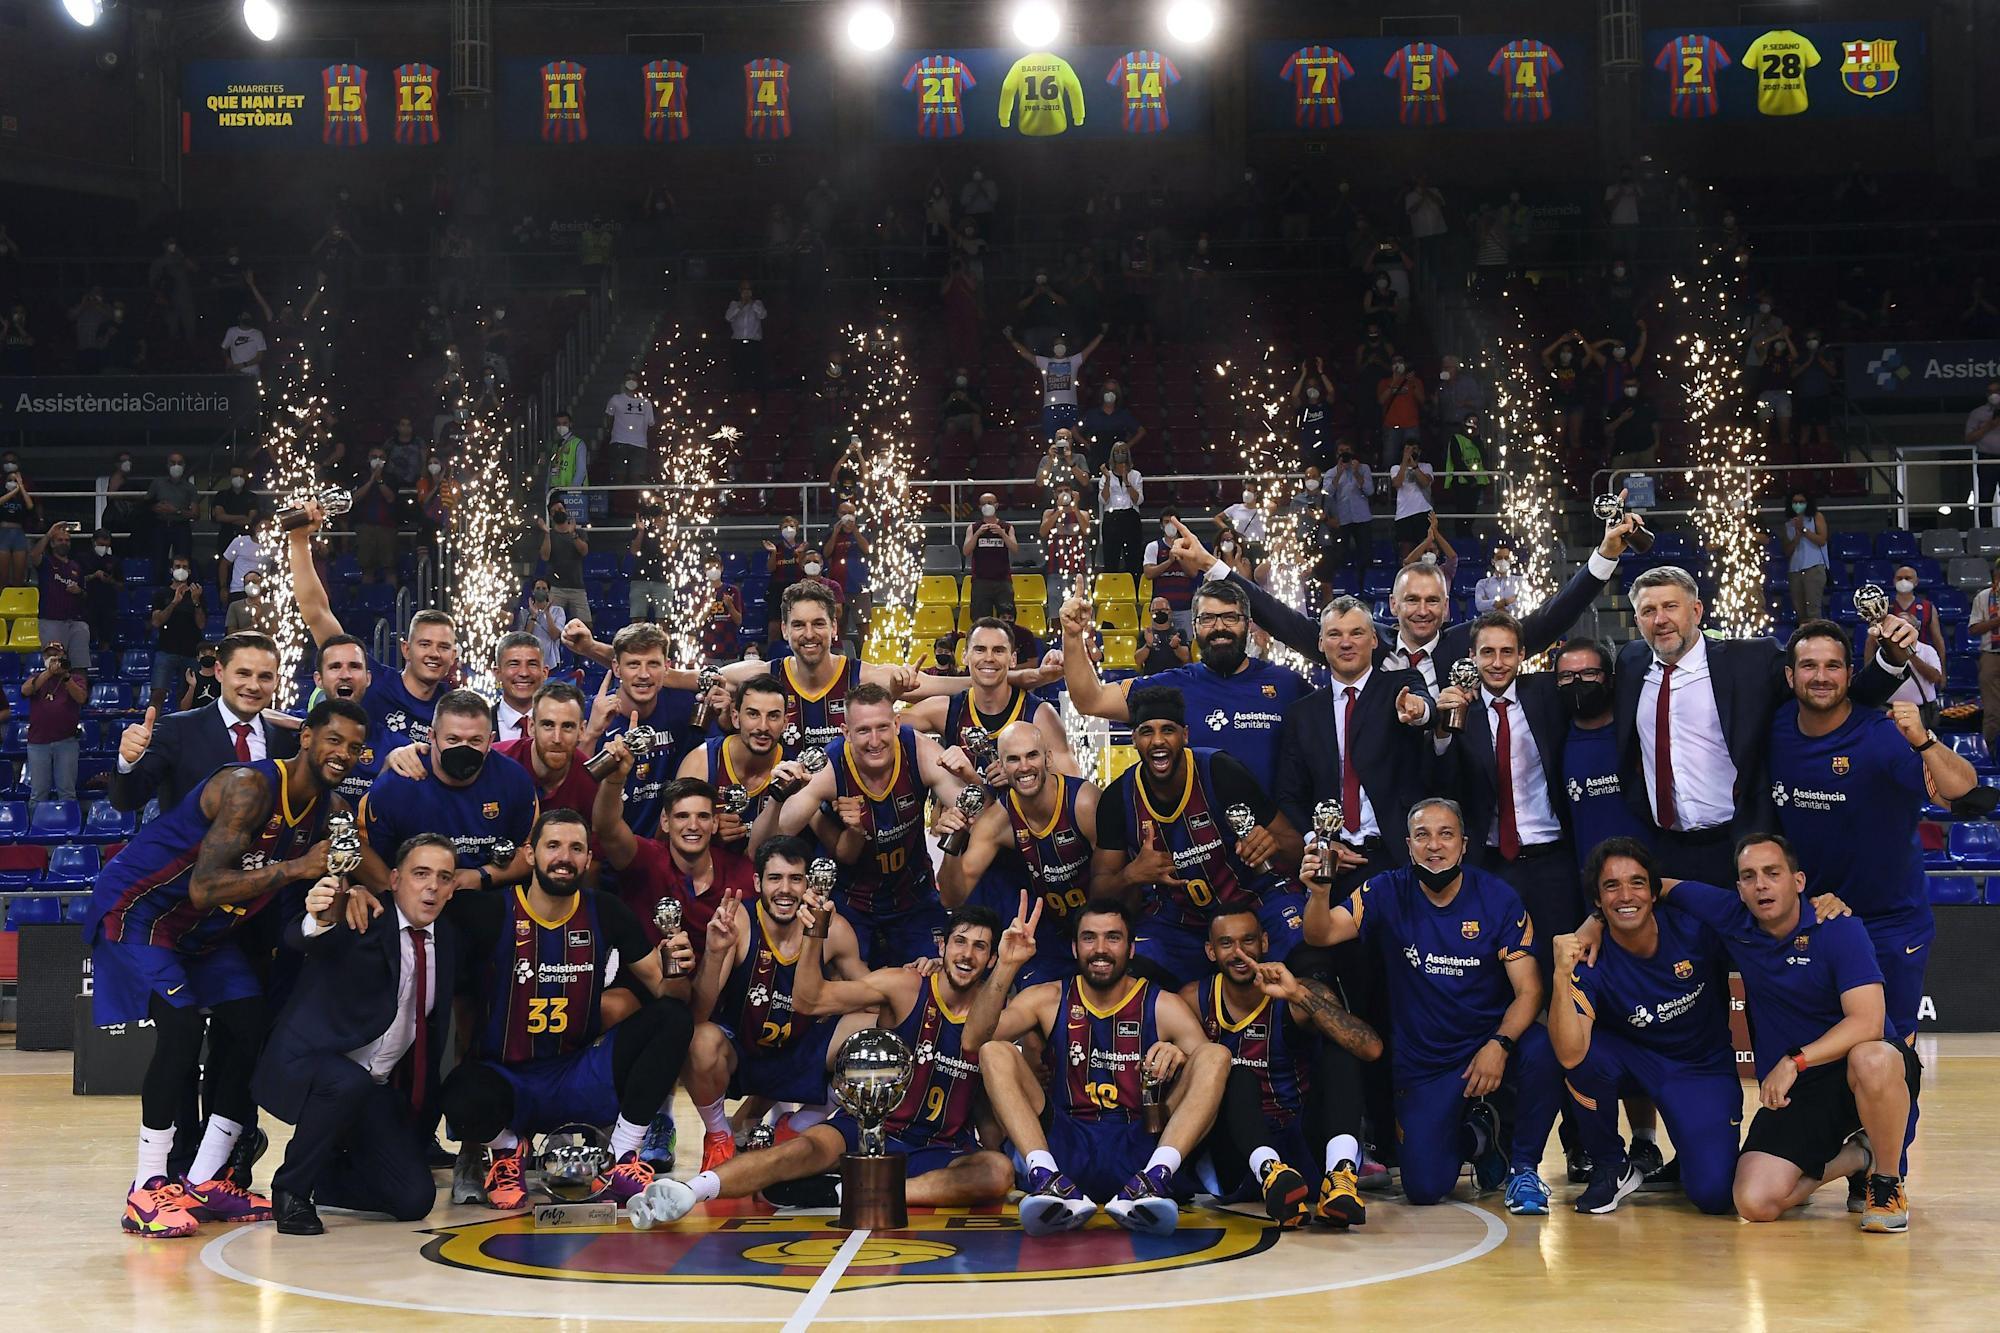 Barcelona won the league title after seven seasons